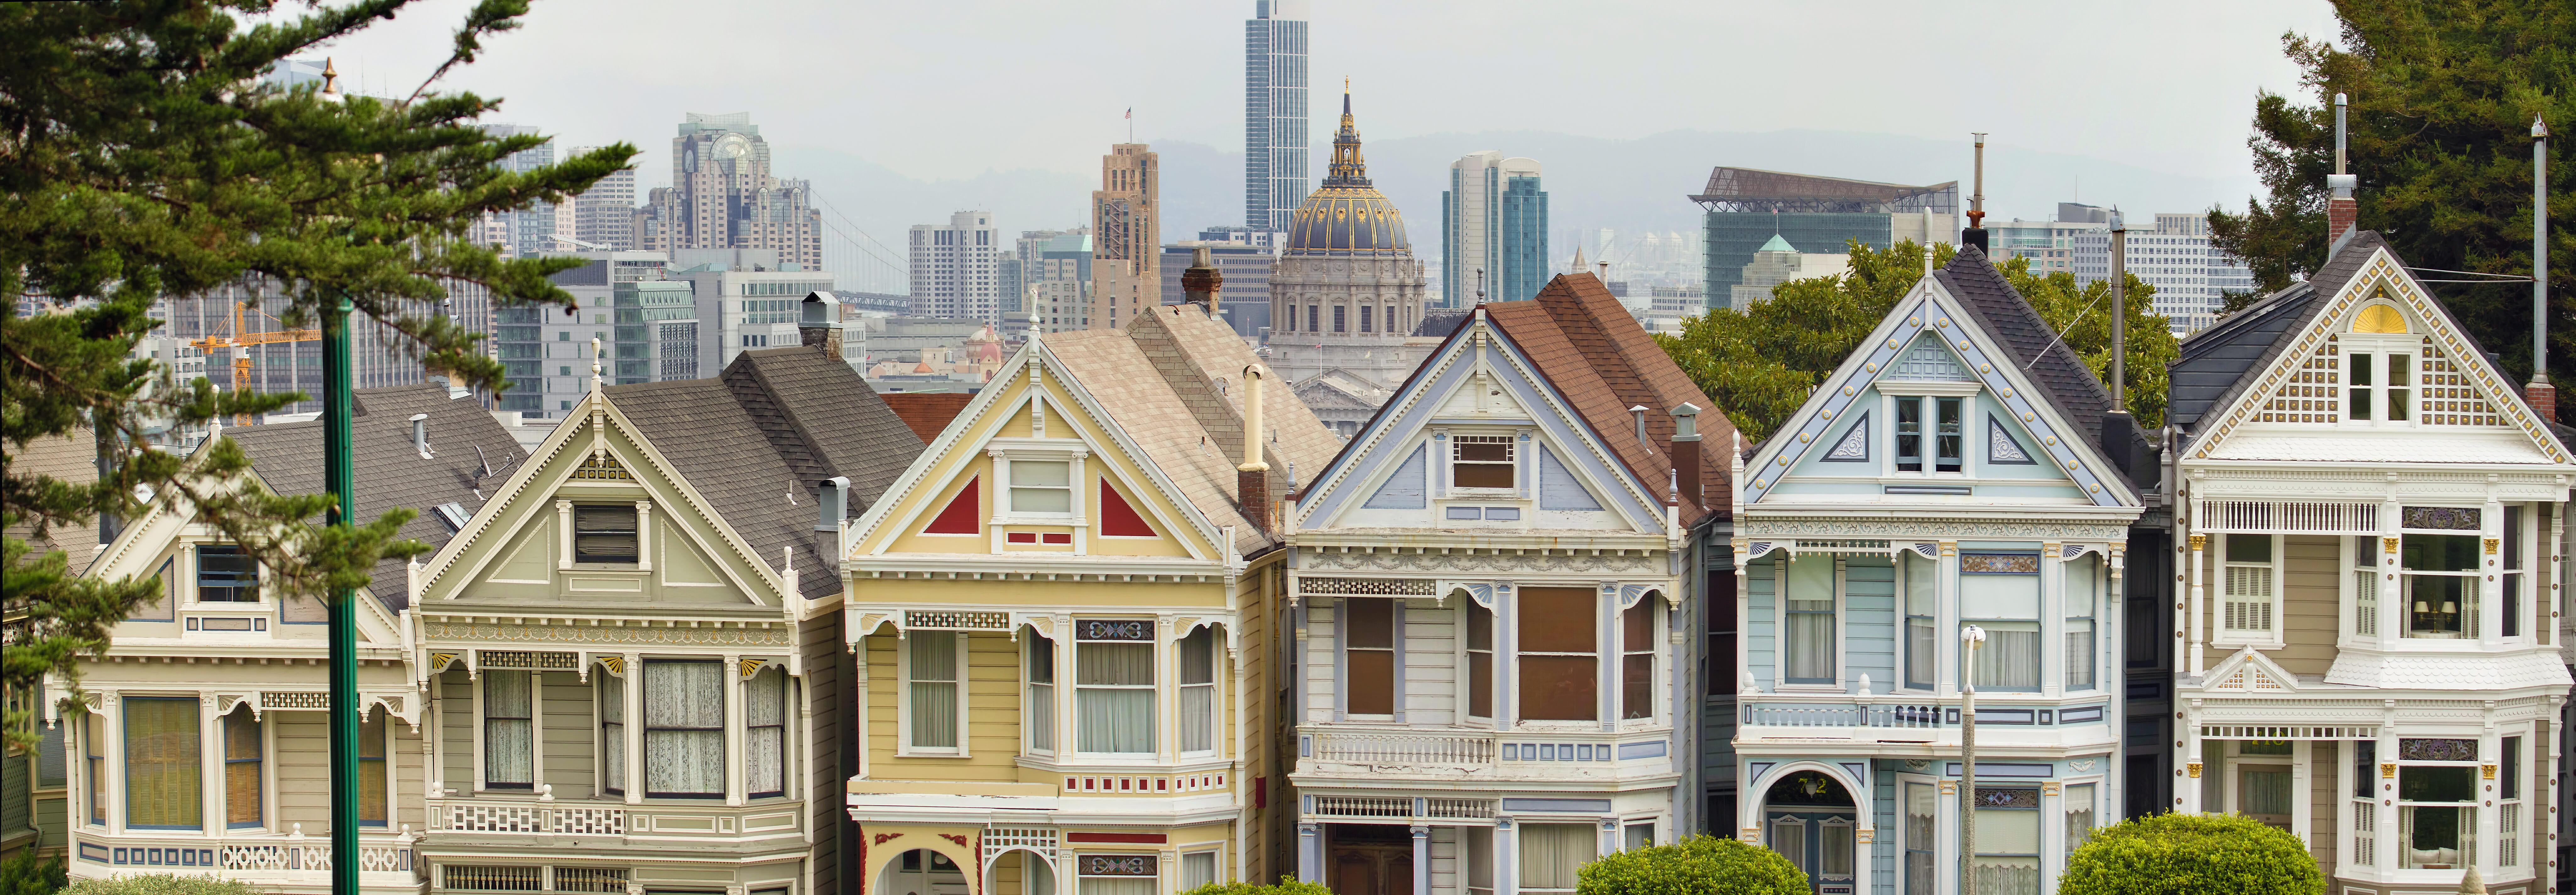 Painted Ladies Row Houses by Alamo Square with San Francisco Skyline Panorama